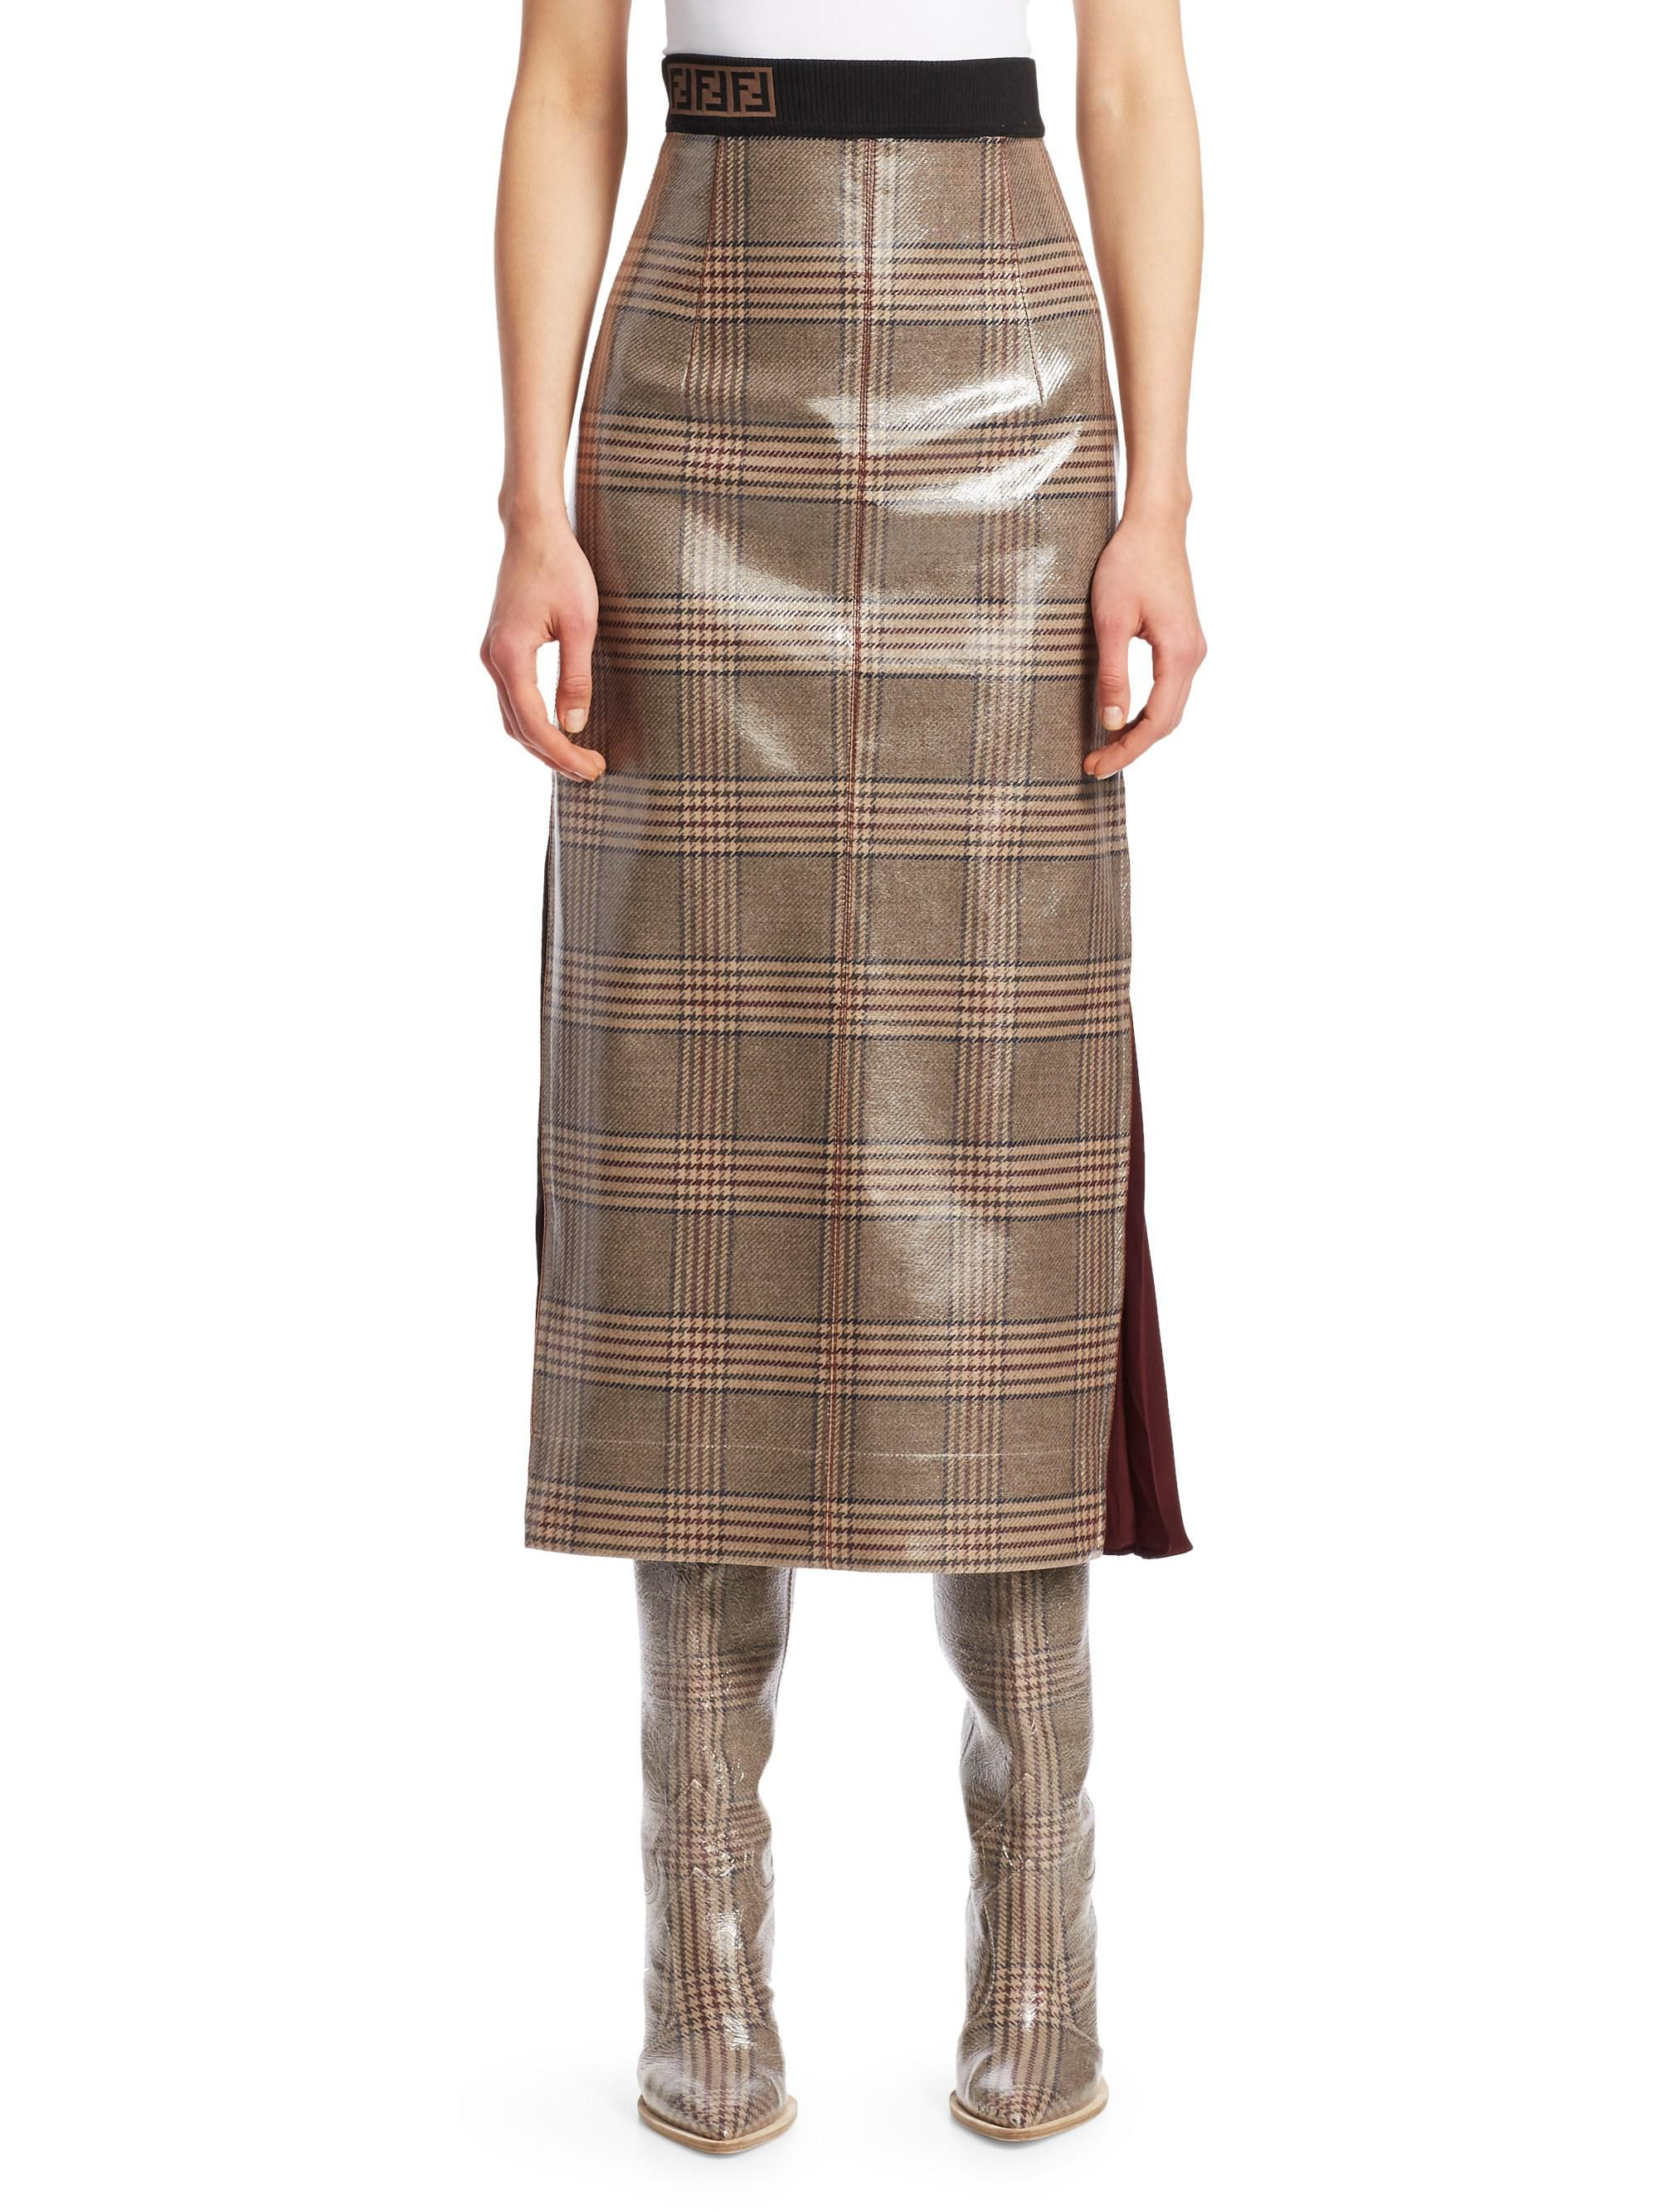 256f44267b24 Fendi Glazed Check Midi Skirt in Brown - Lyst